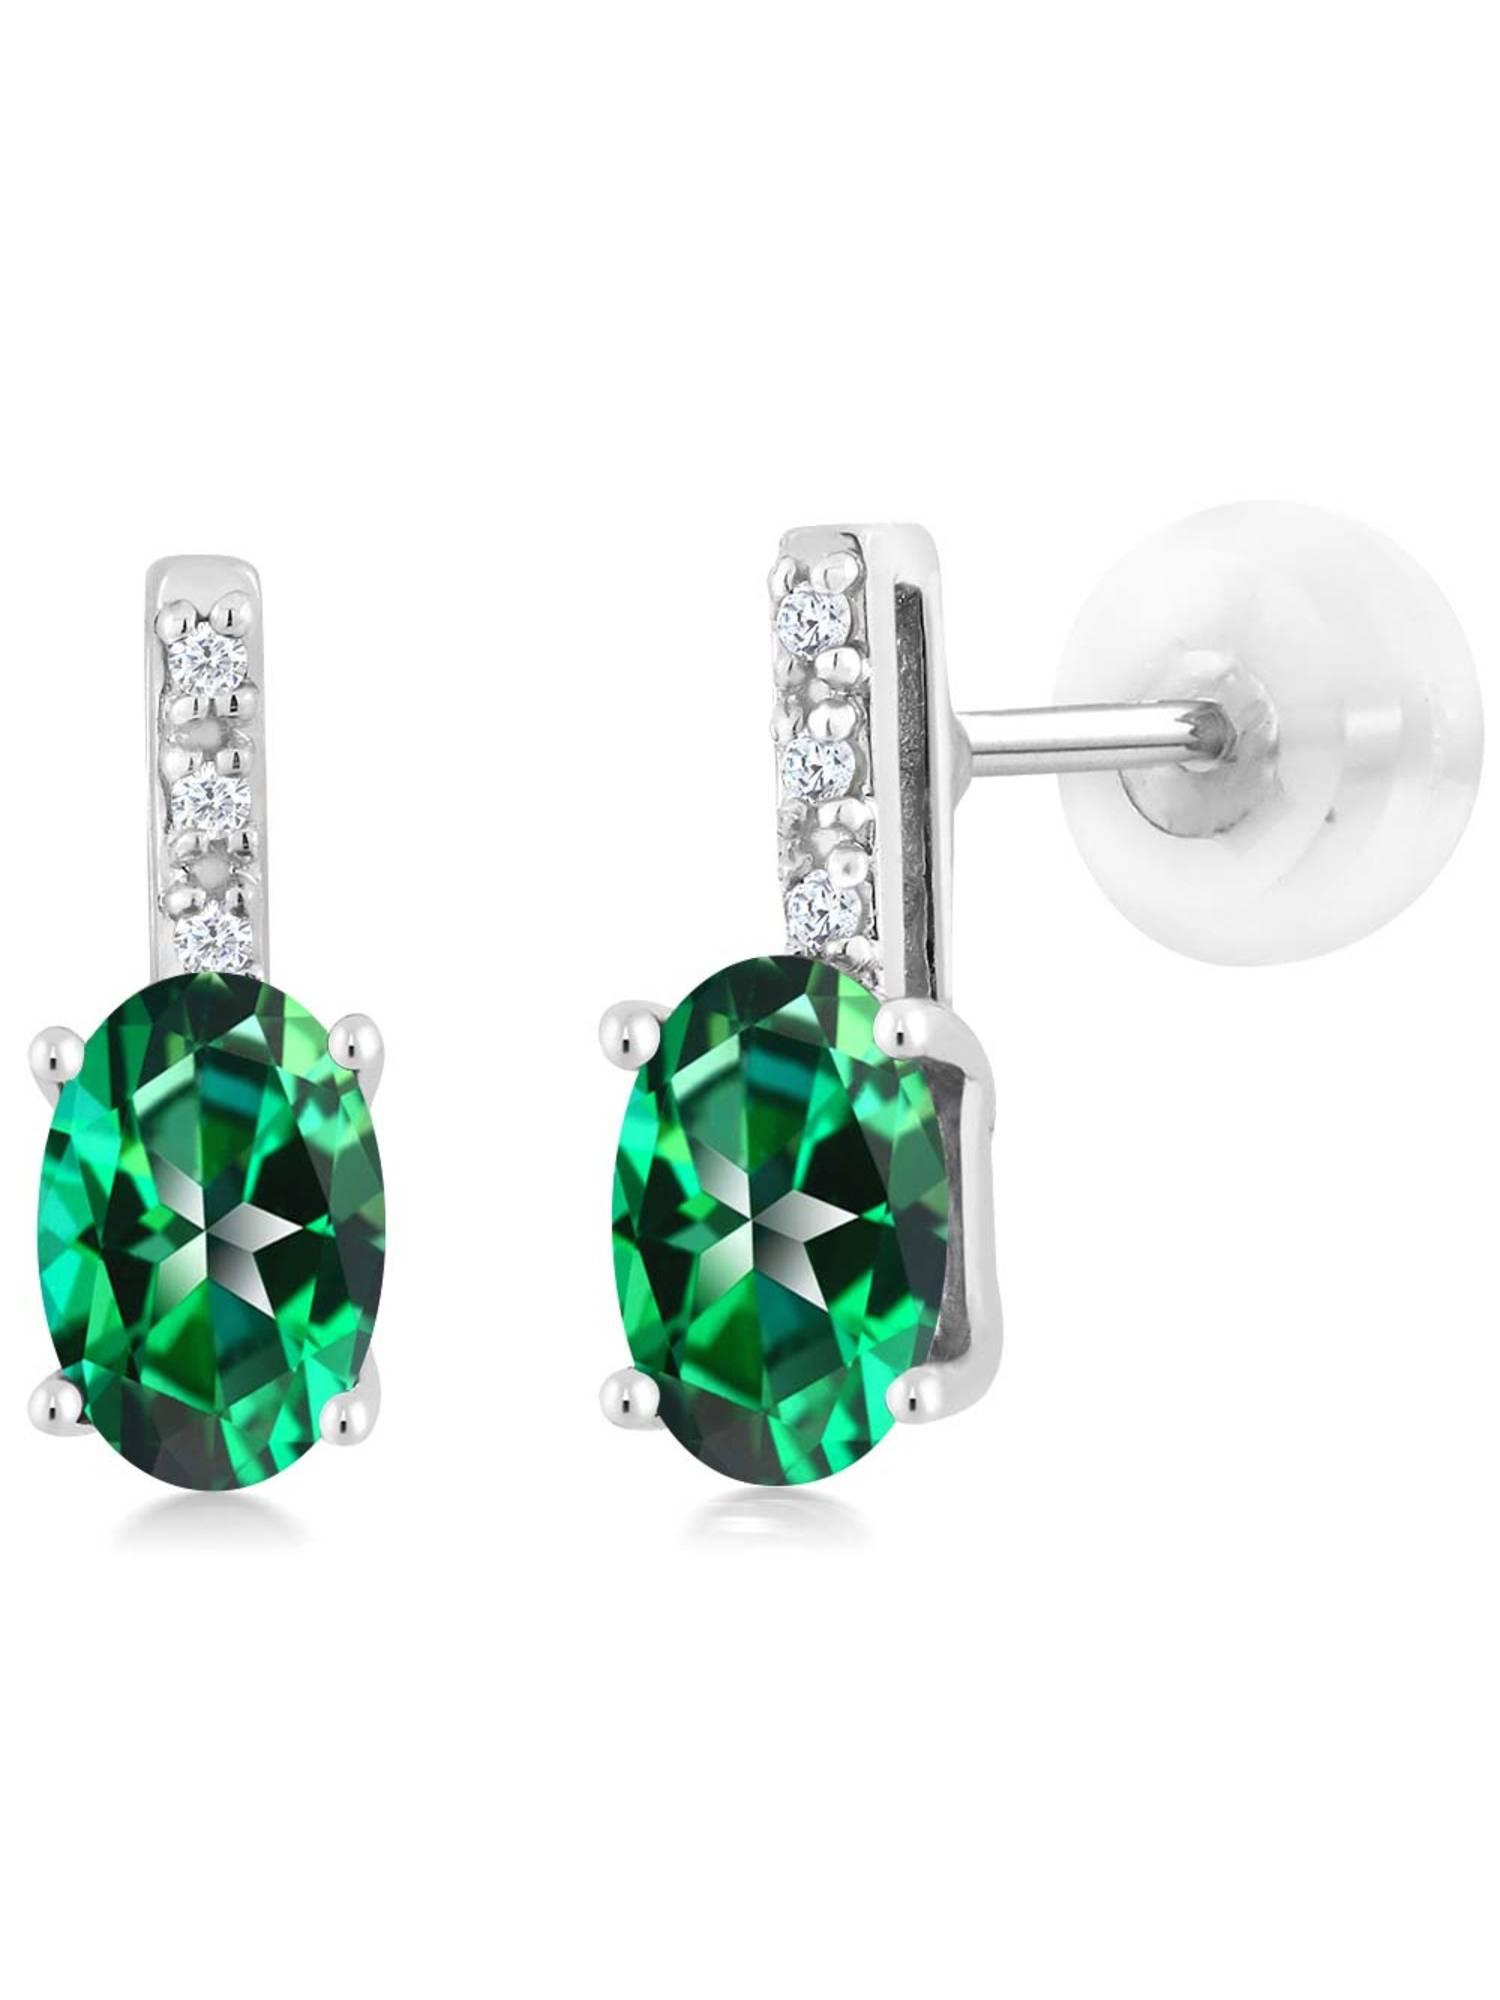 10K White Gold Diamond Earrings Set with Oval Rainforest Topaz from Swarovski by